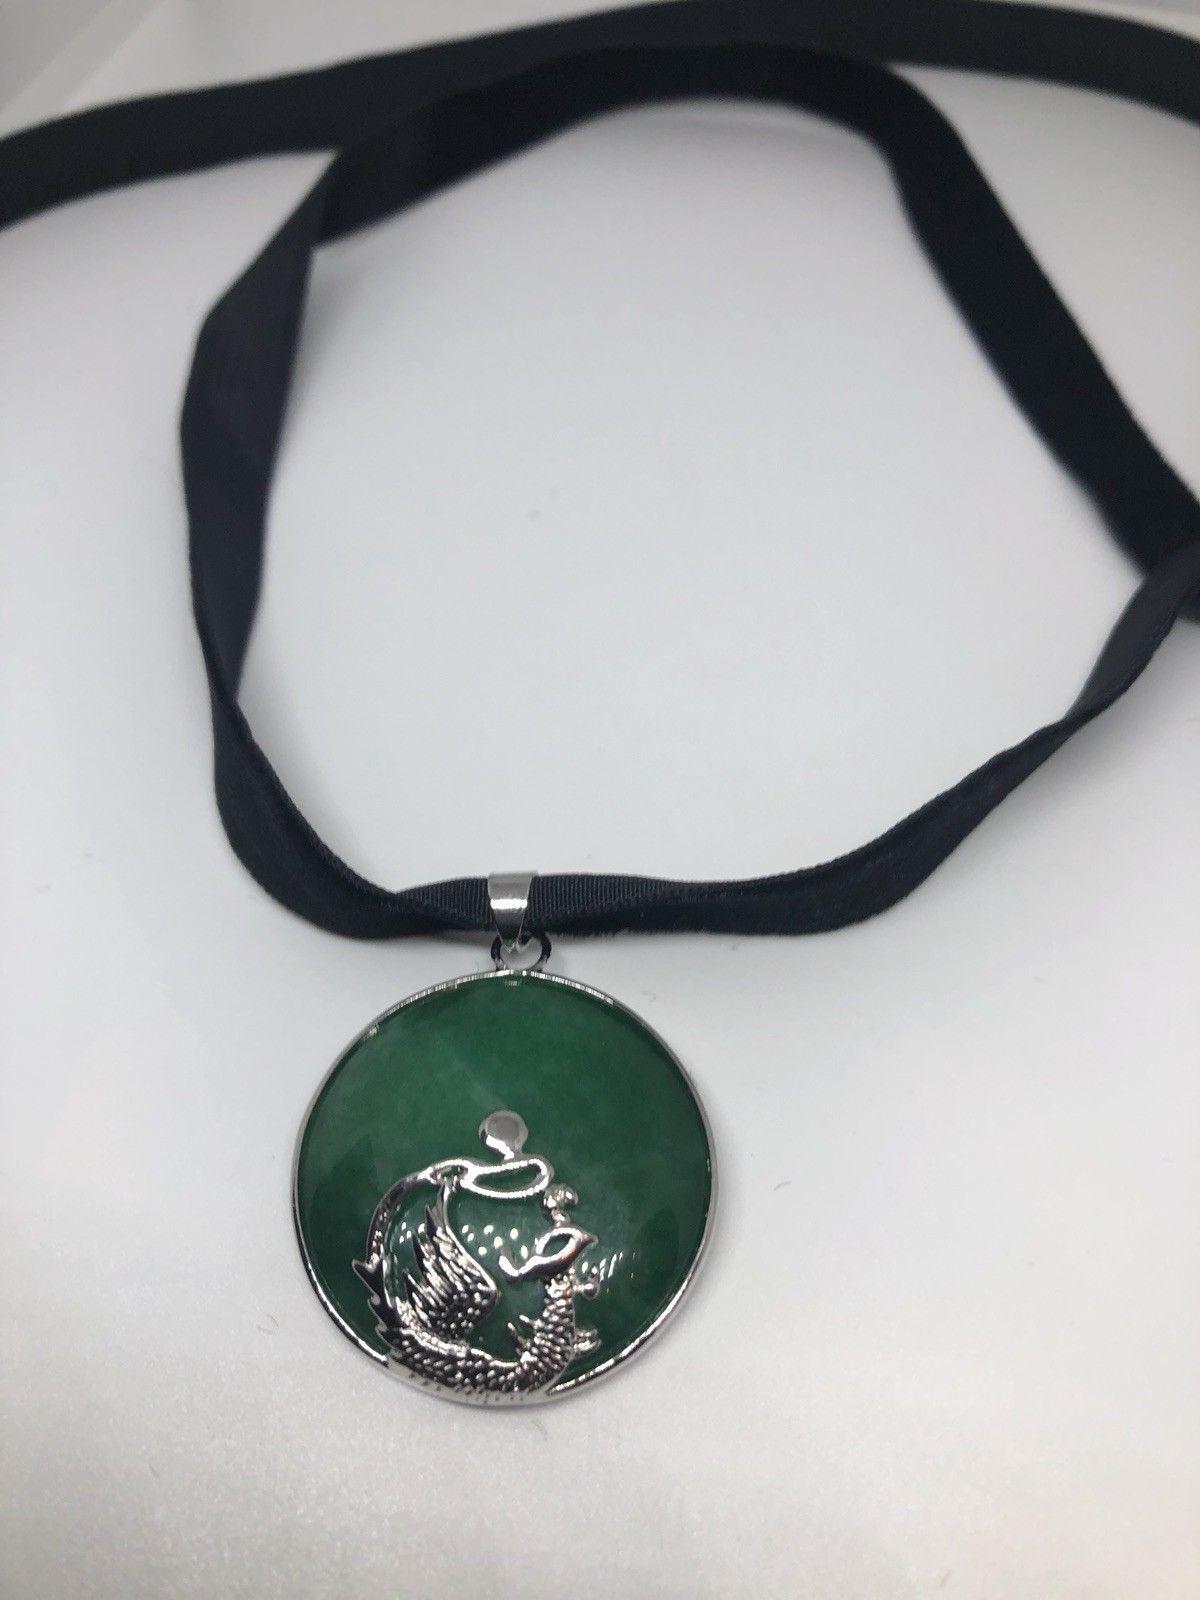 Vintage Jade White Bronze Silver Pendant Necklace Choker Pendant